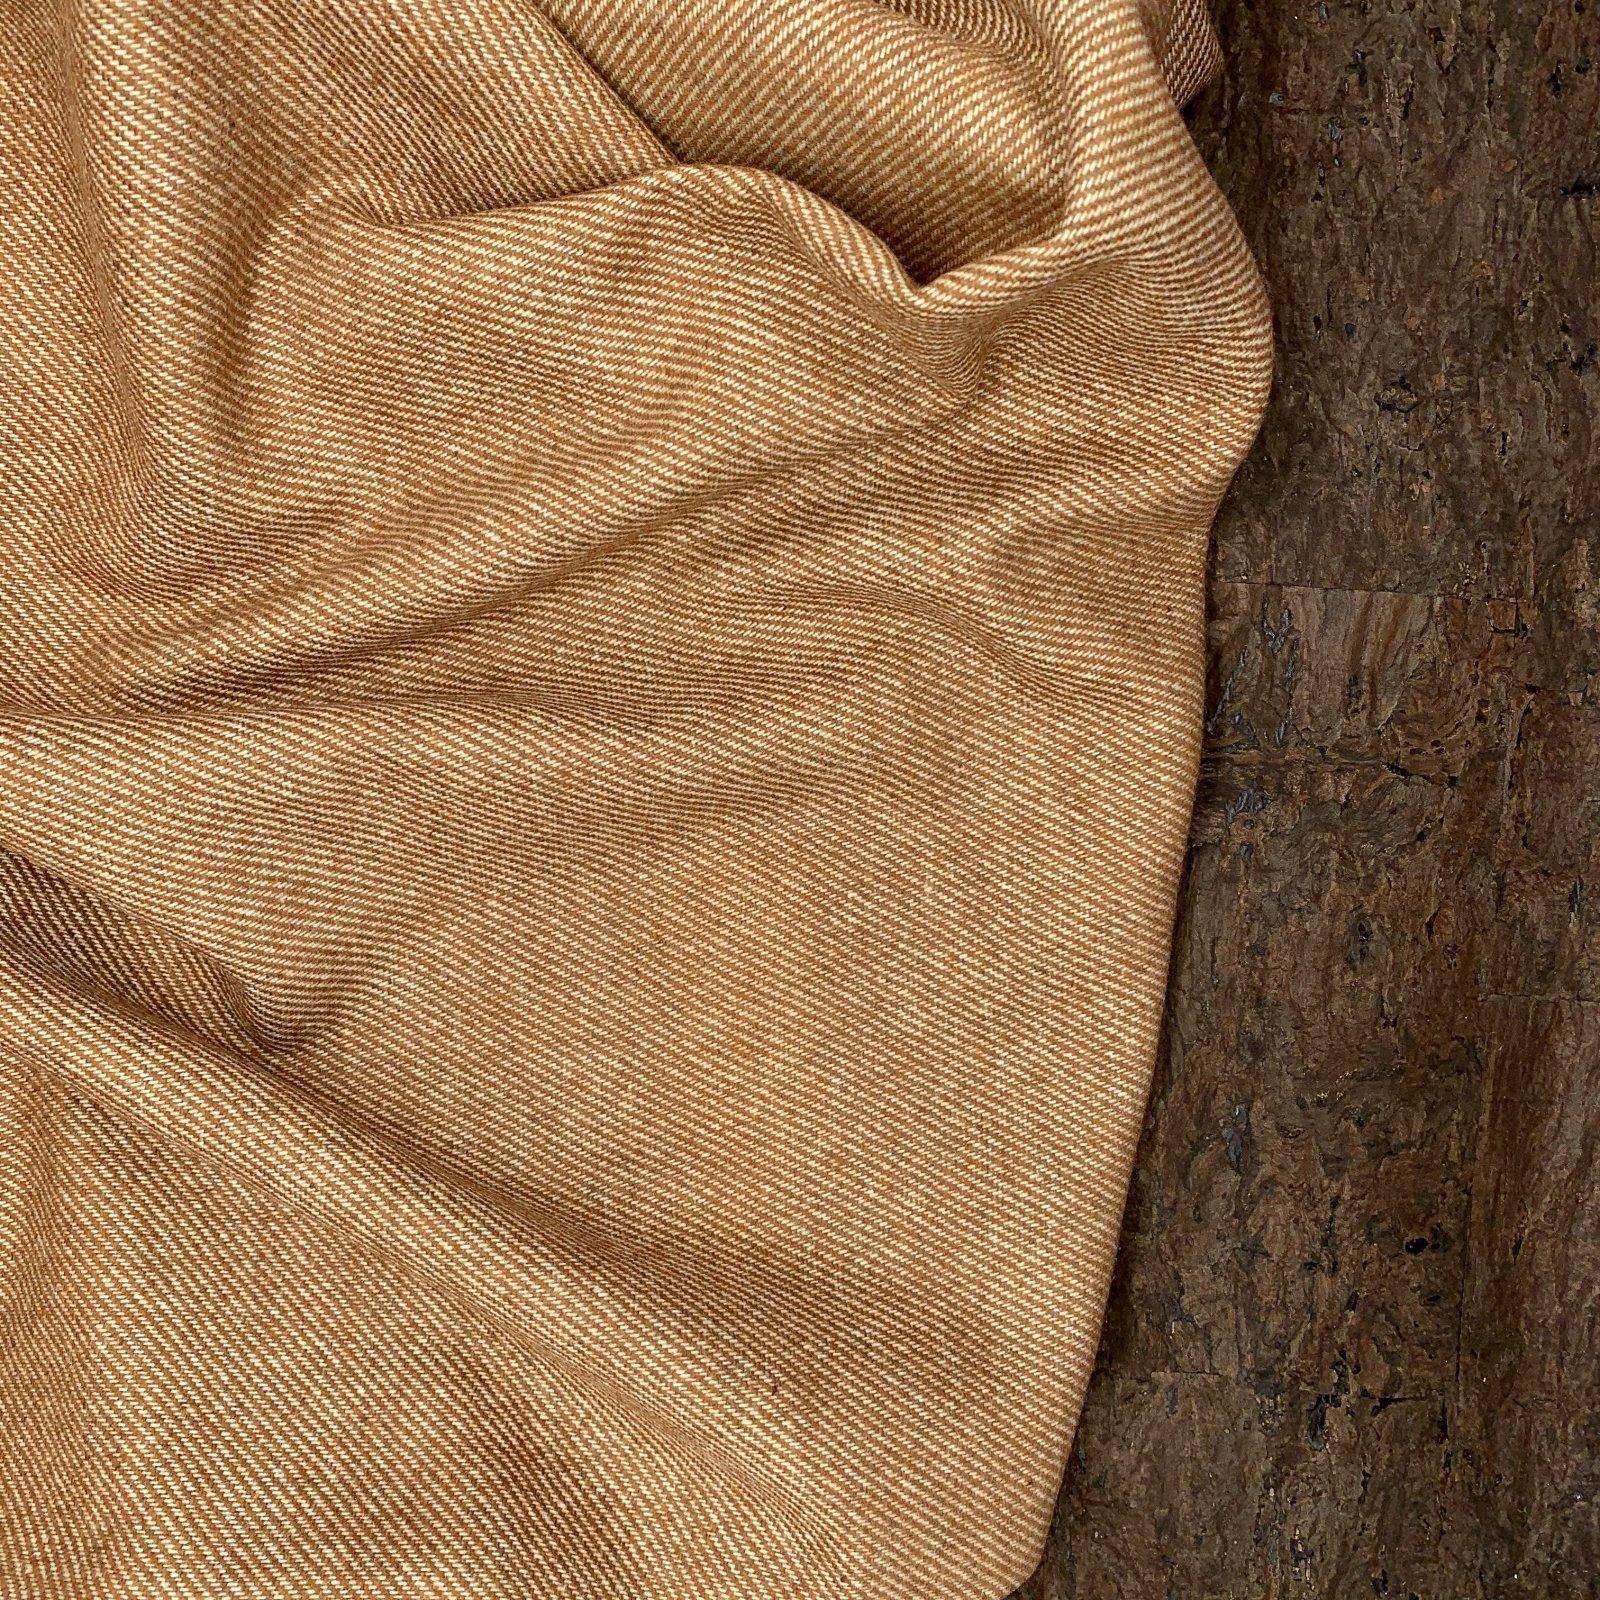 Designer Wool Coating - Sienna Twill